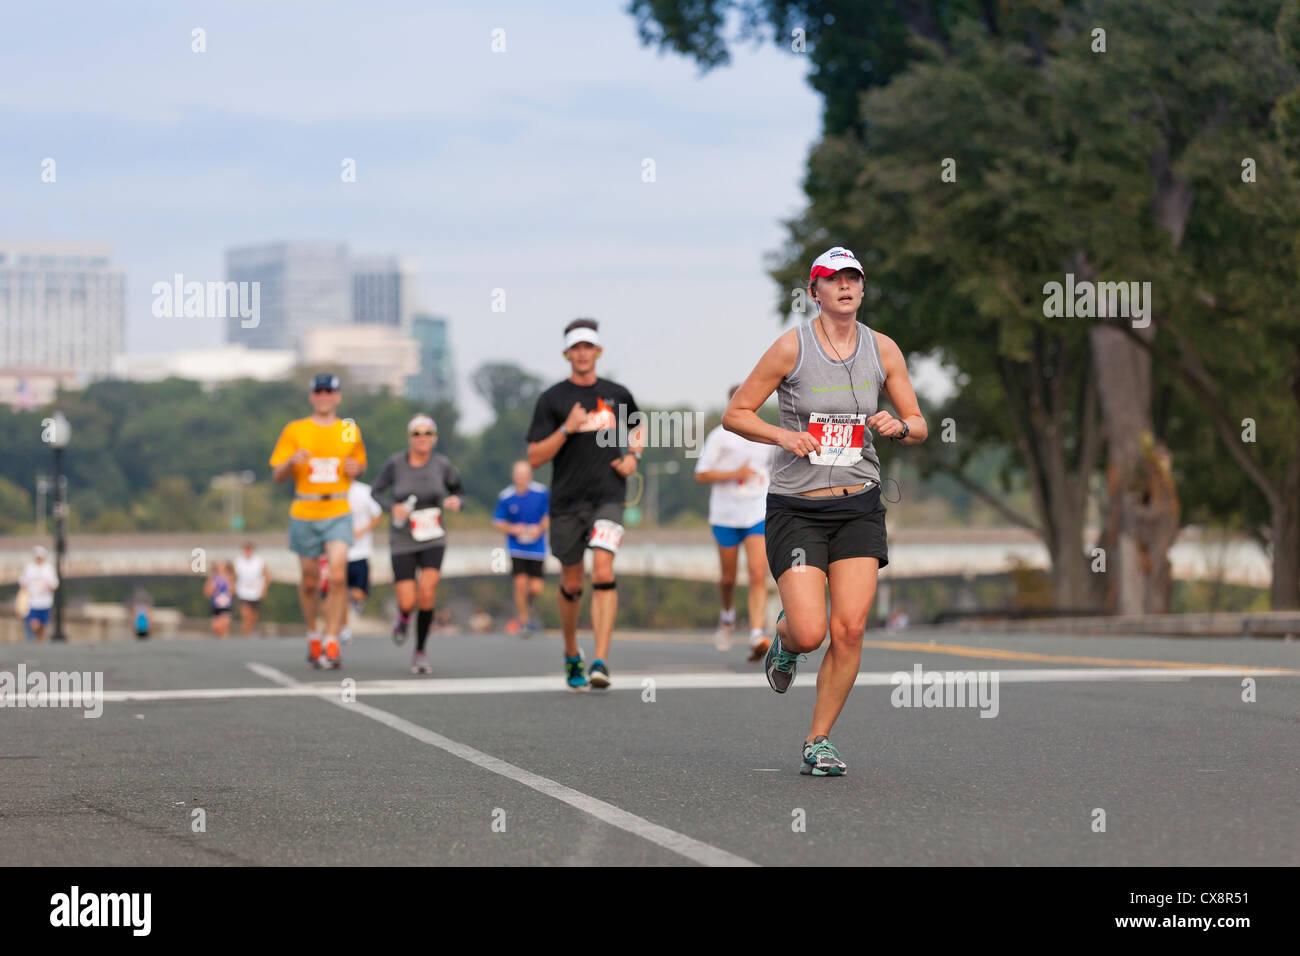 Course de Marathon runners Photo Stock